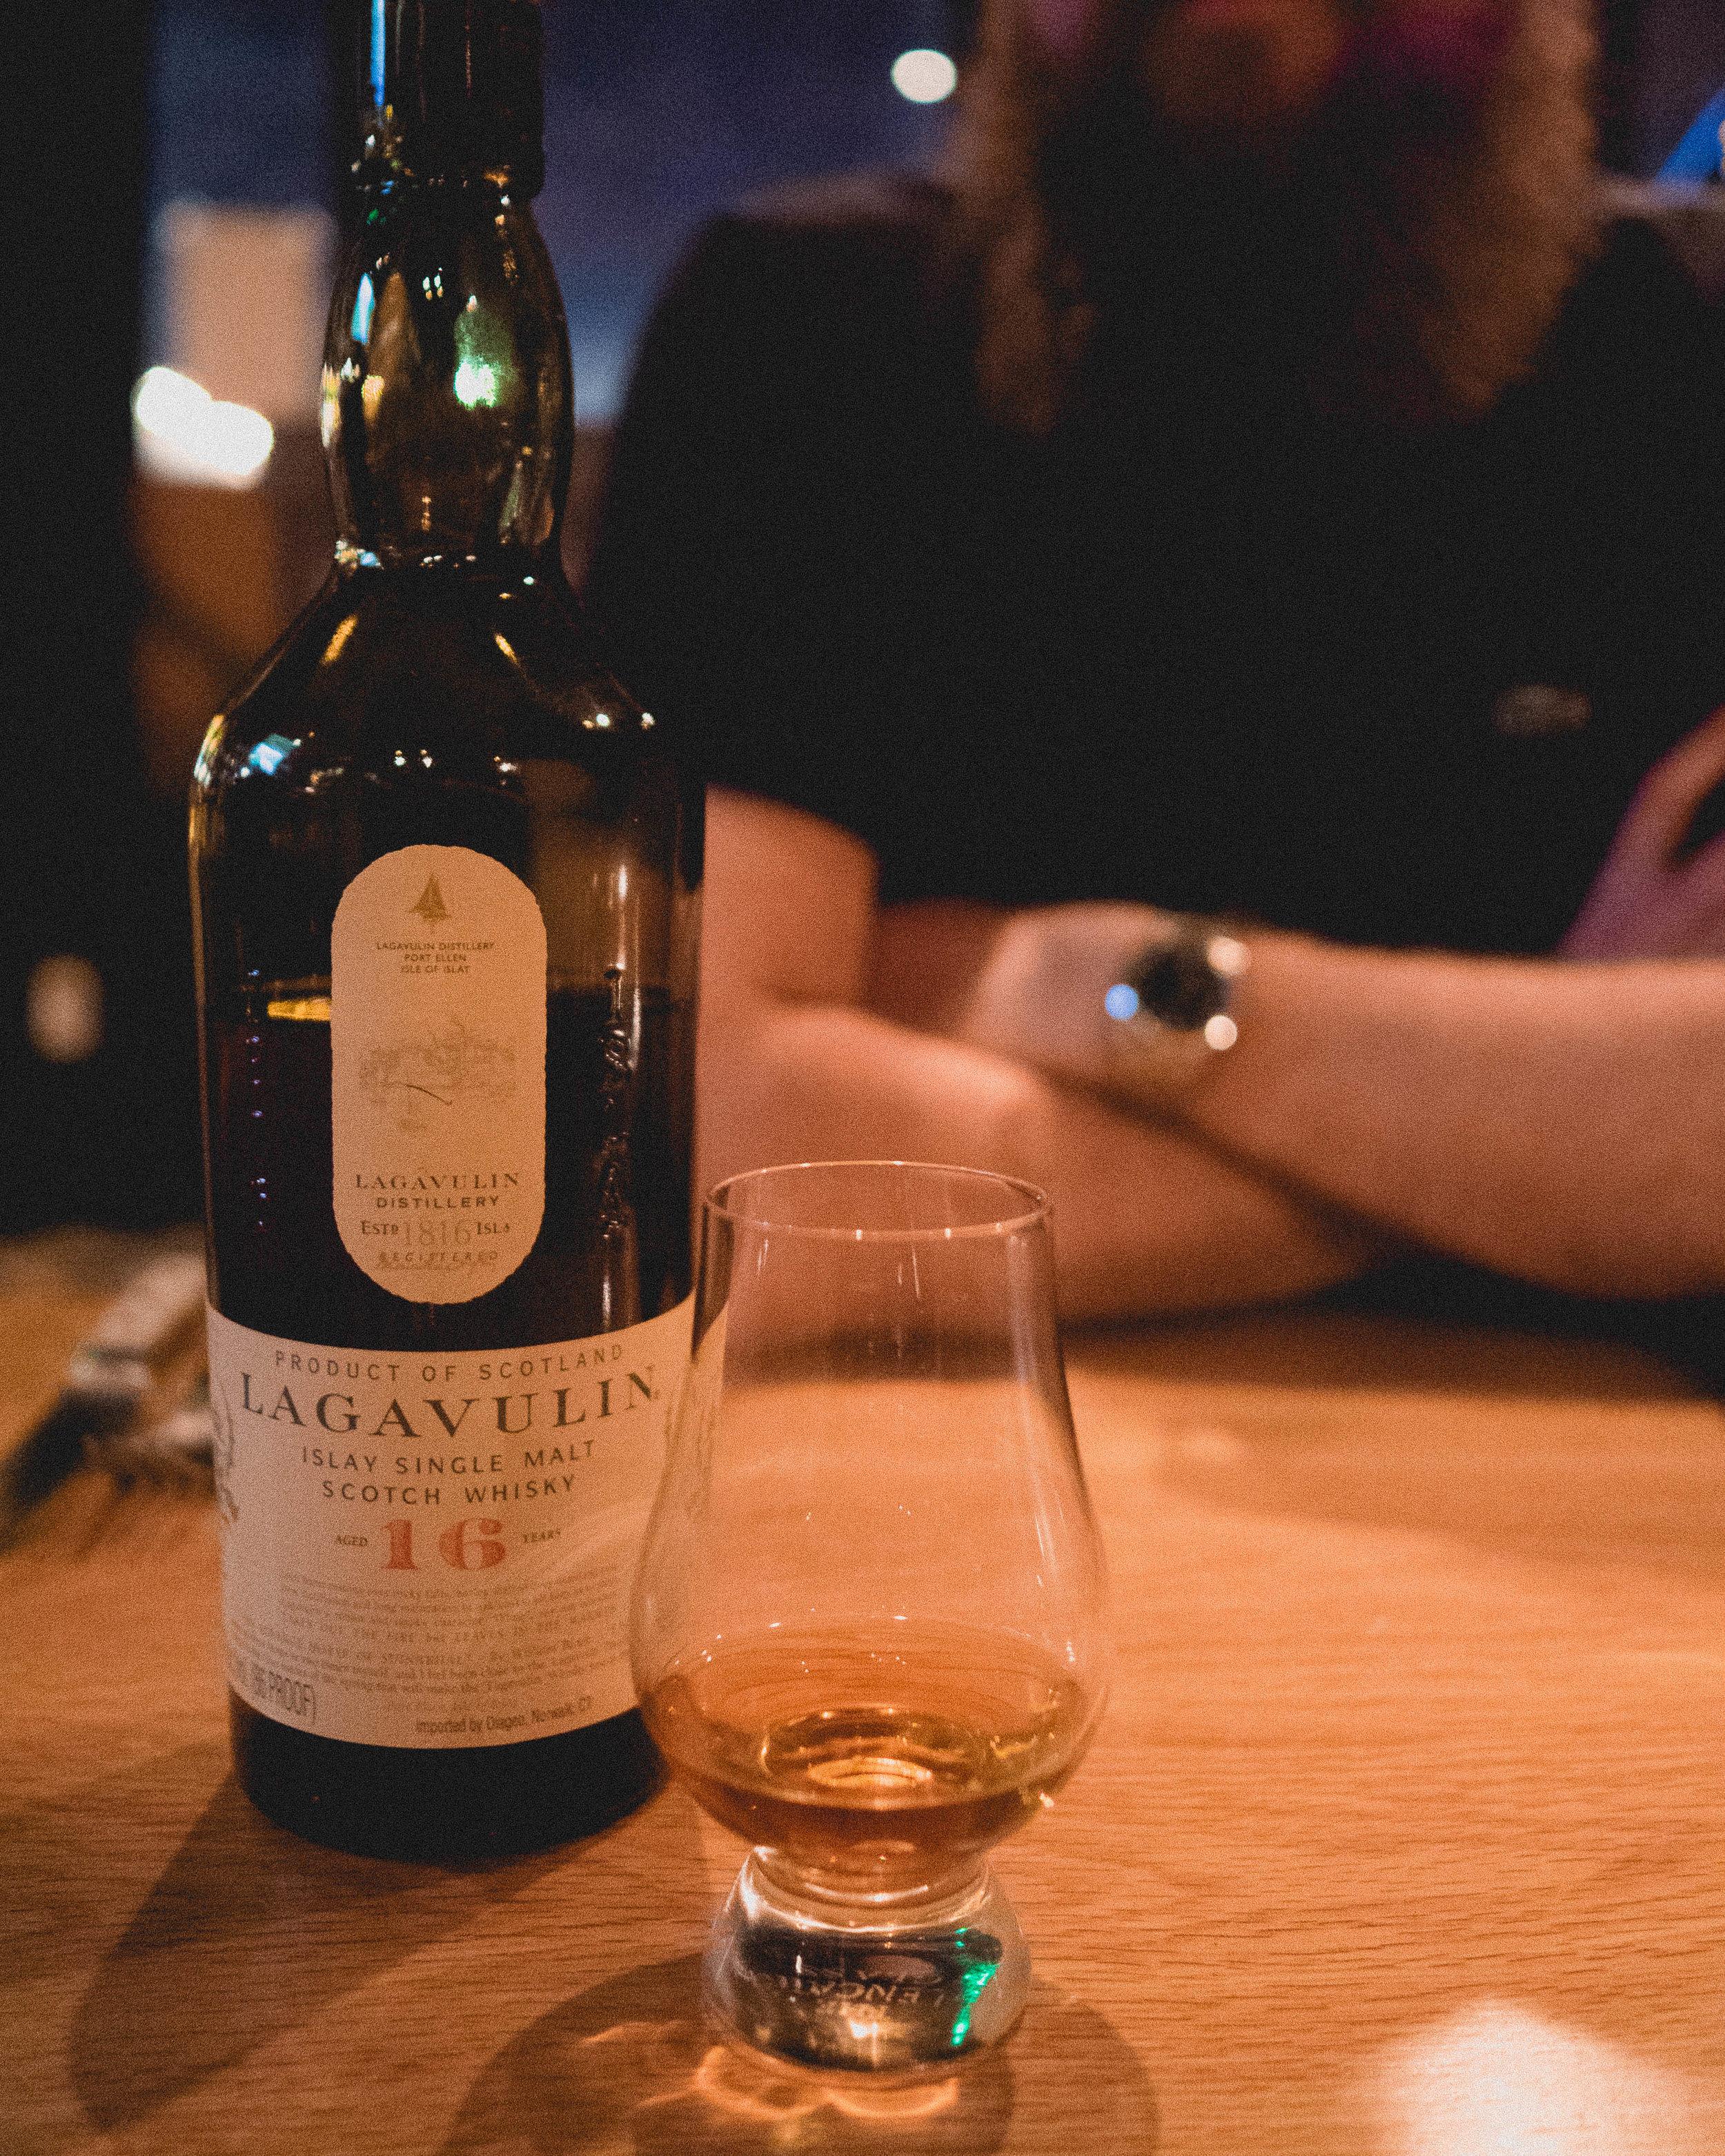 whisky #3:  lagavulin  islay single malt scotch whisky, aged 16 years.